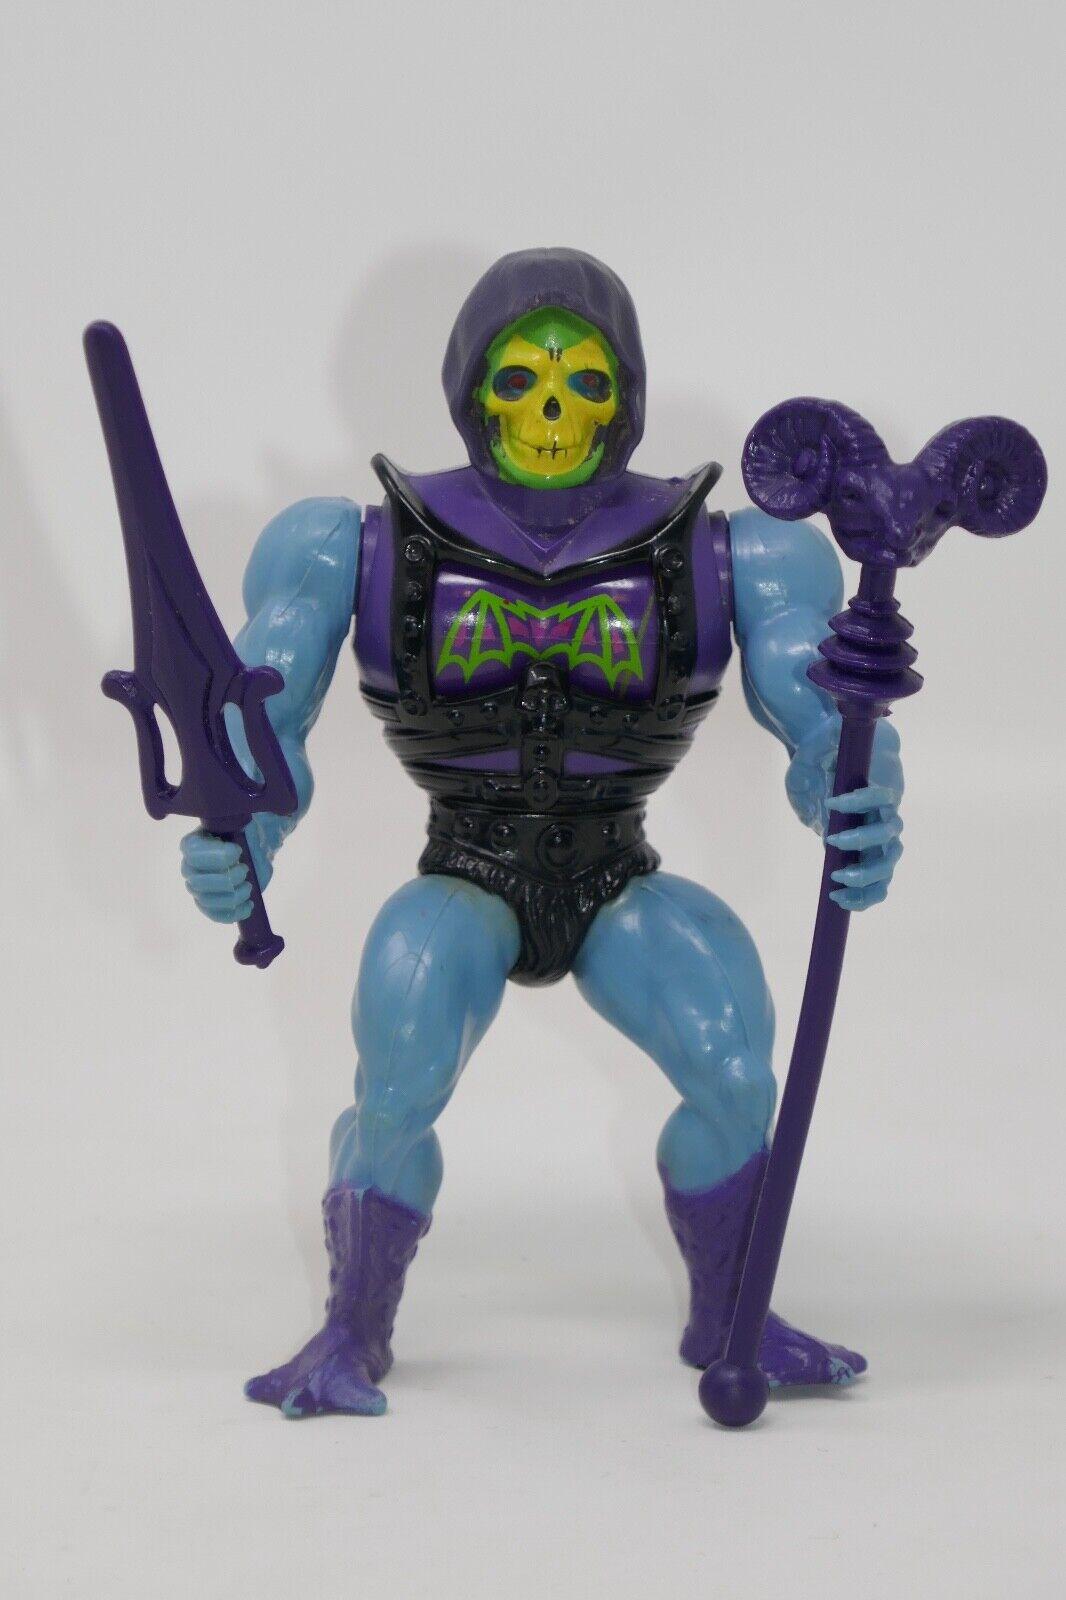 Mattel 1984 He-Man Masters of the Universe MOTU Skeletor Action Figure COMPLETE